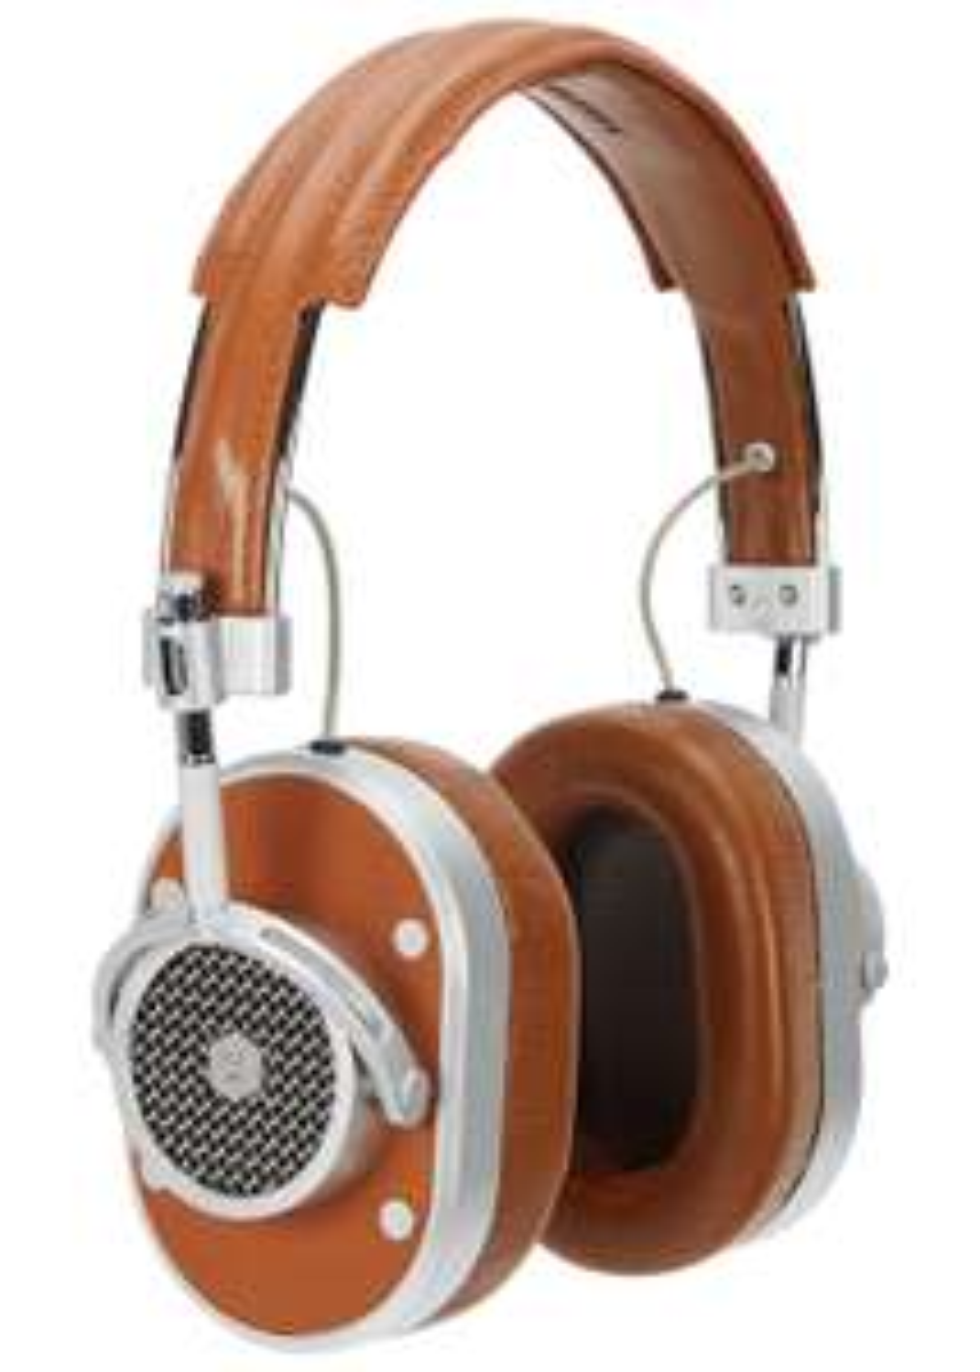 HEADPHONES MASTER & DYNAMIC MH40 £160 and KEF M400 £78 / M500 £128  @ Harvey Nichols